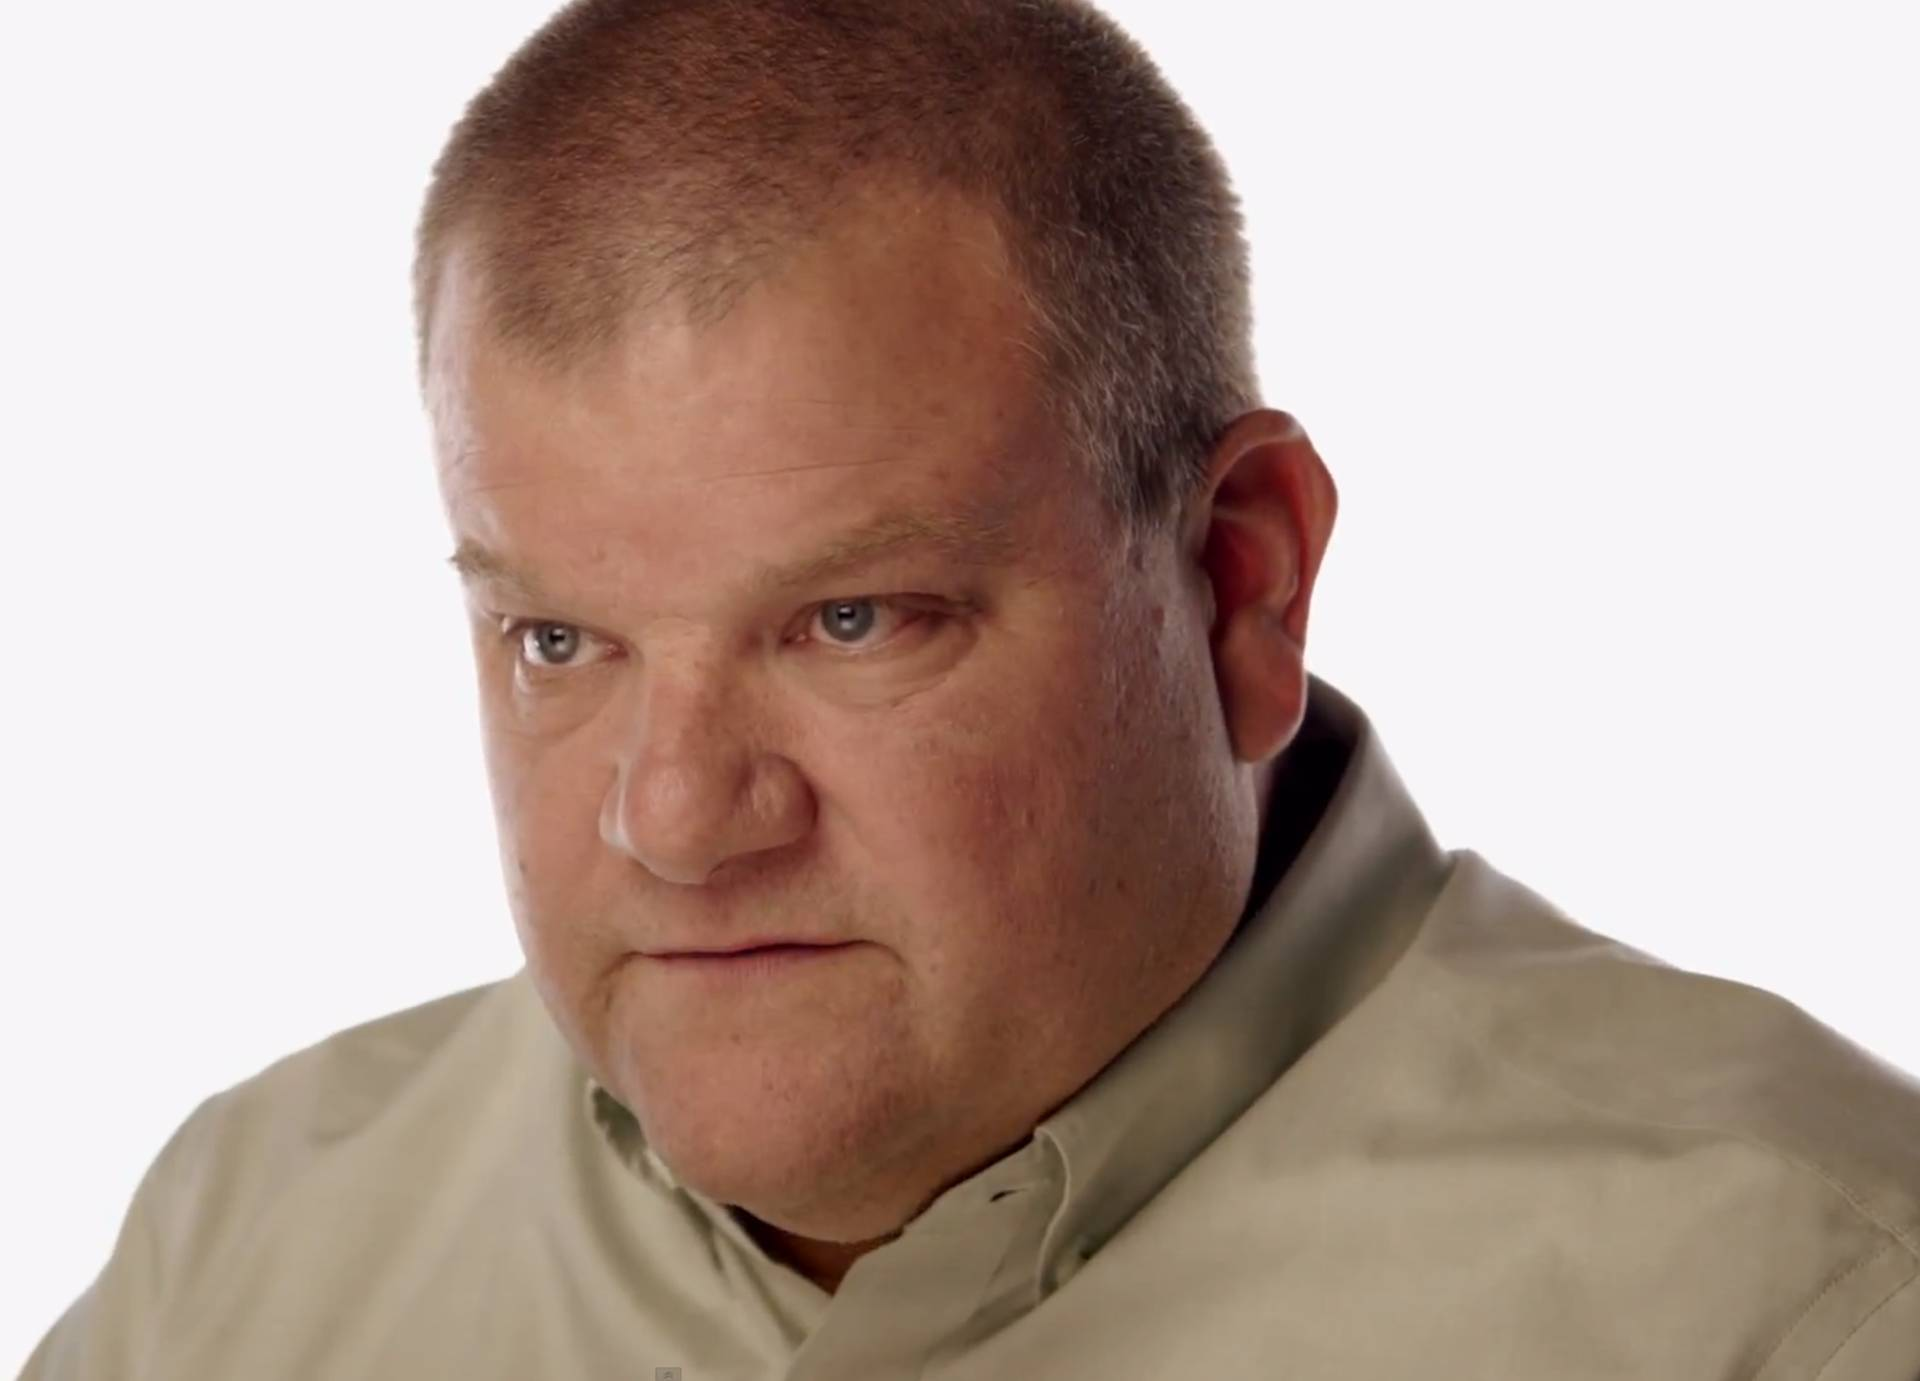 iPhone 5 promo (Bob Mansfield 002)